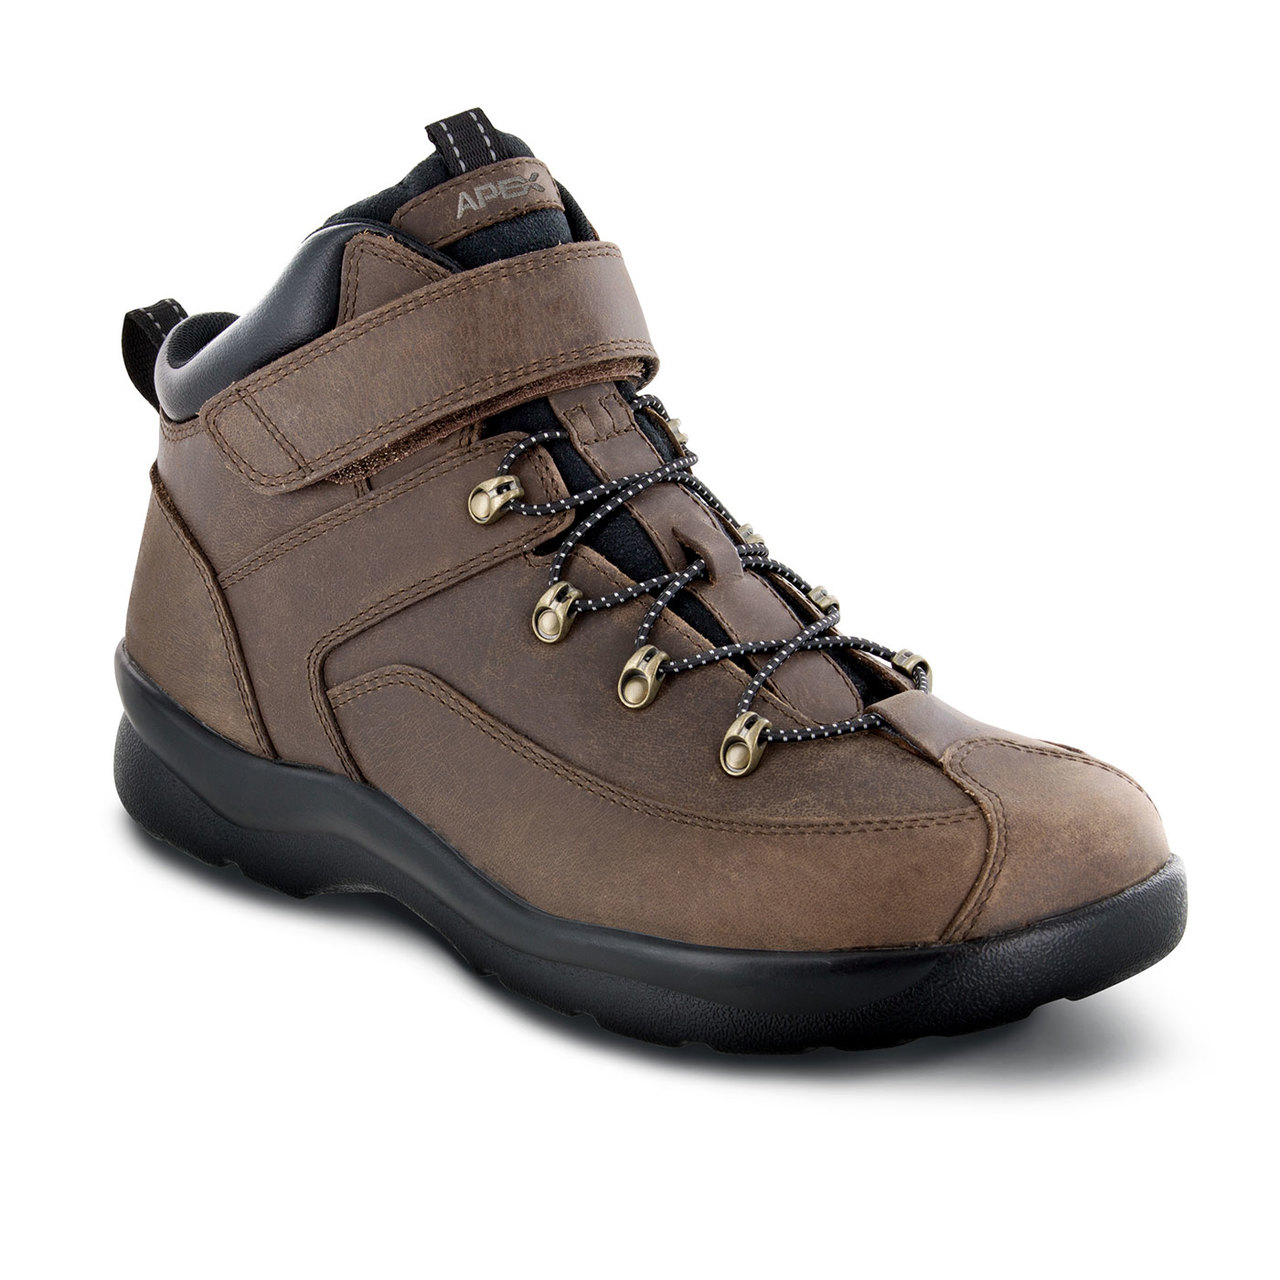 Apex Mens Ariya Hiking Boot Brown 13